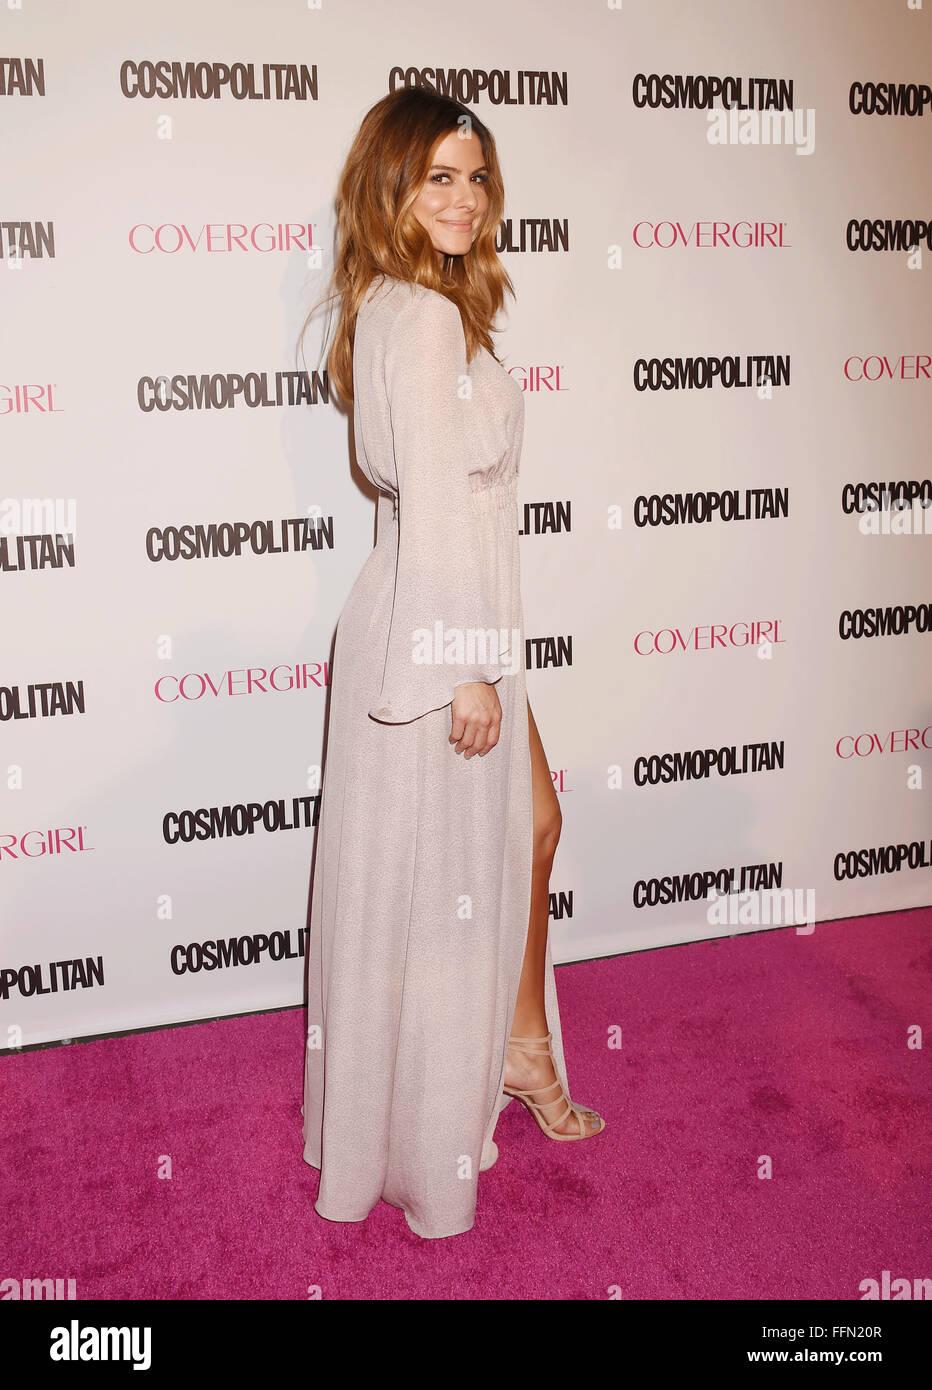 TV personality Maria Menounos arrives at Cosmopolitan Magazine's 50th Birthday Celebration at Ysabel on October - Stock Image